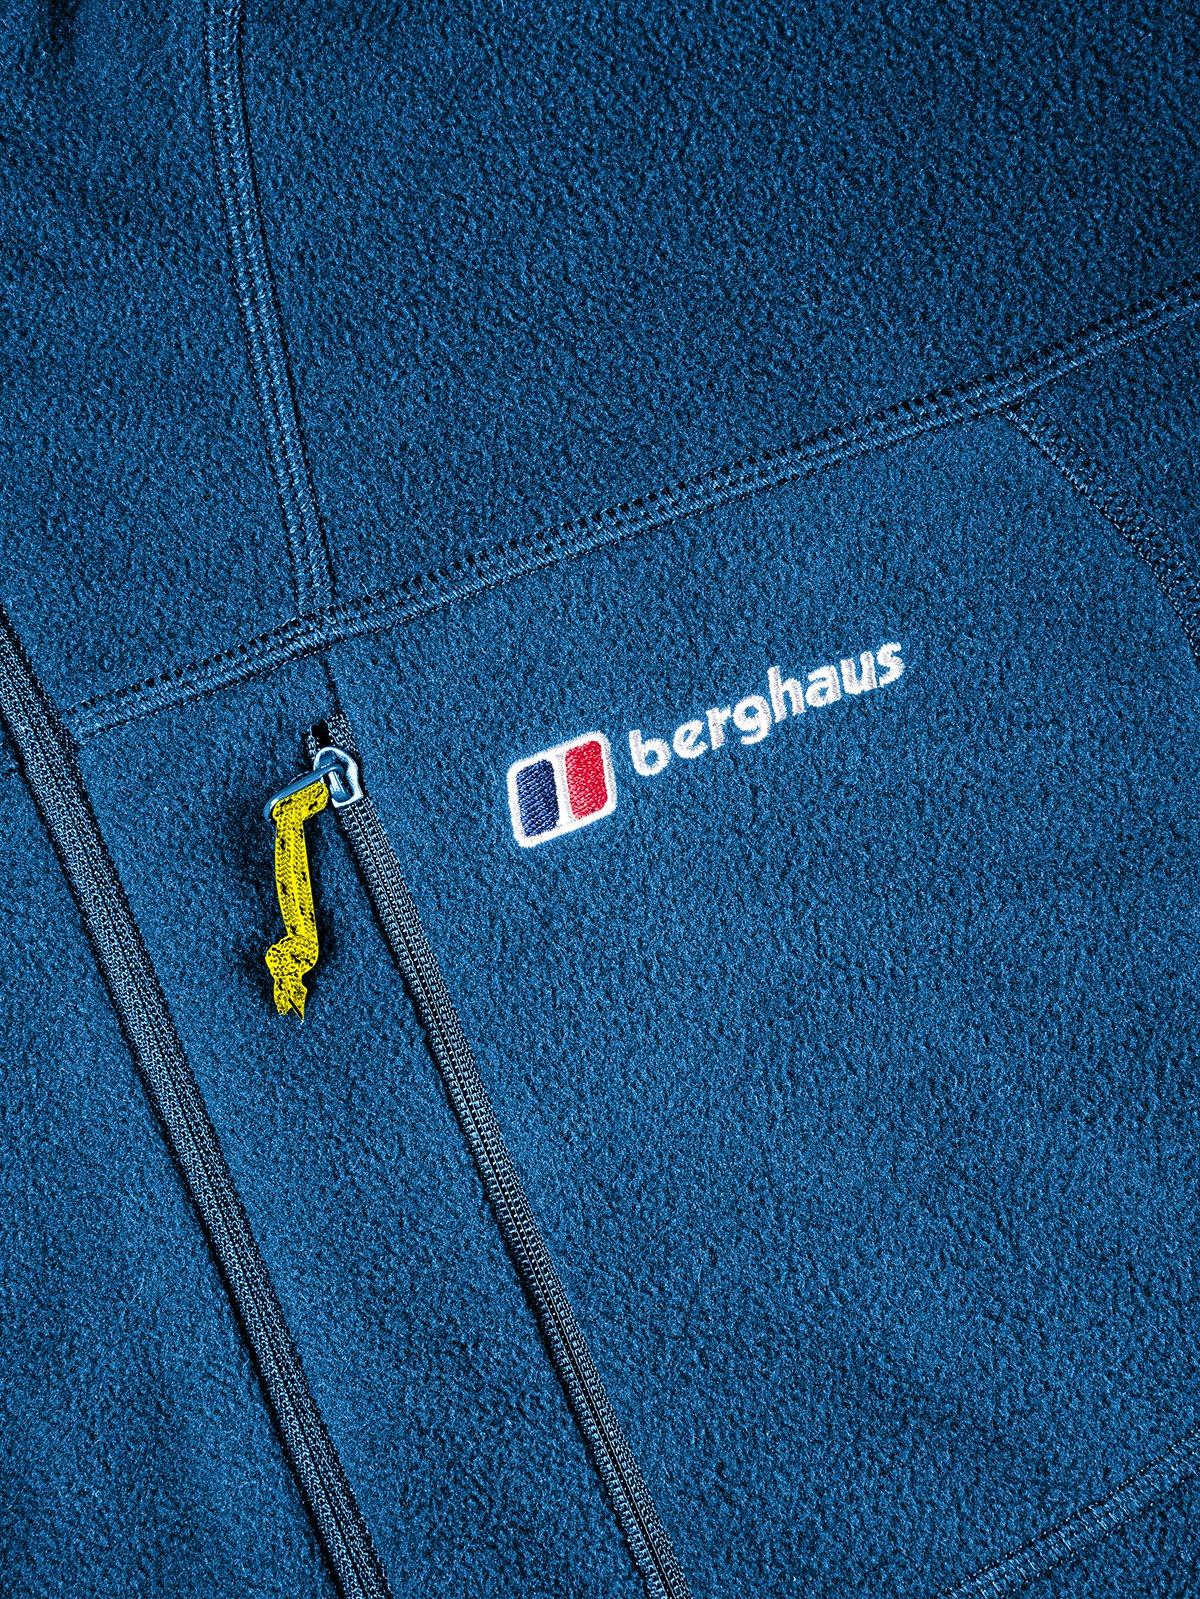 Berghaus Mens Spectrum Micro 2.0 Full Zip Fleece Jacket 7